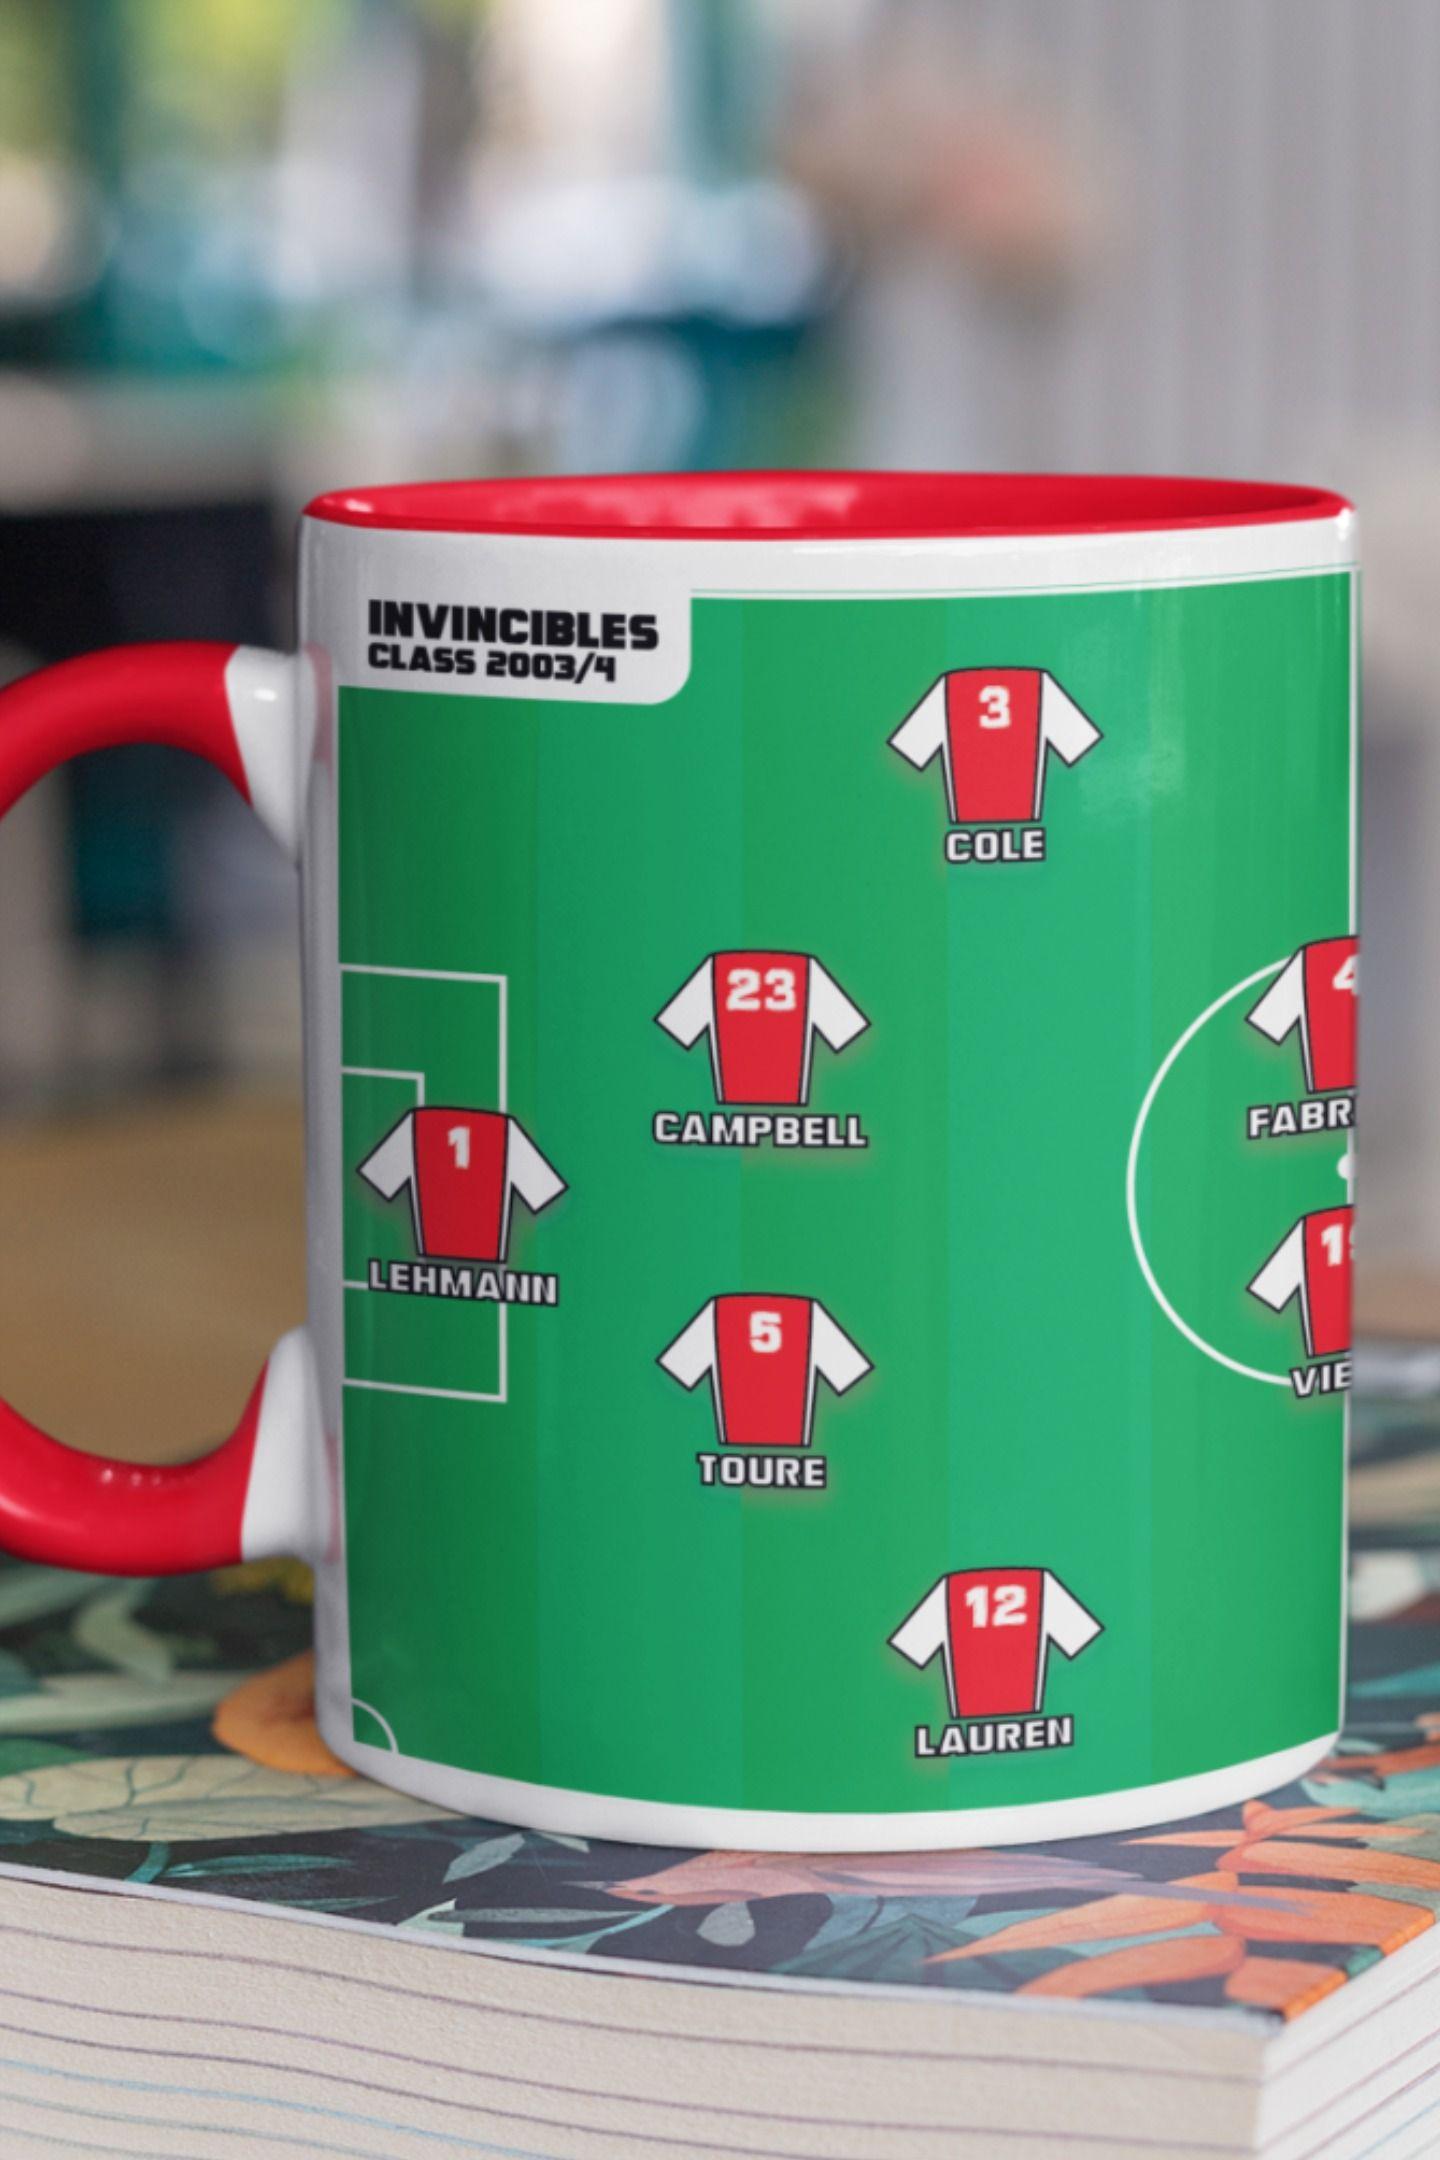 Arsenal The Invincibles Squad Mug Arsenal Mug Football Mug Gunners Arsenal Football Gift Football Gifts Mugs Arsenal Football